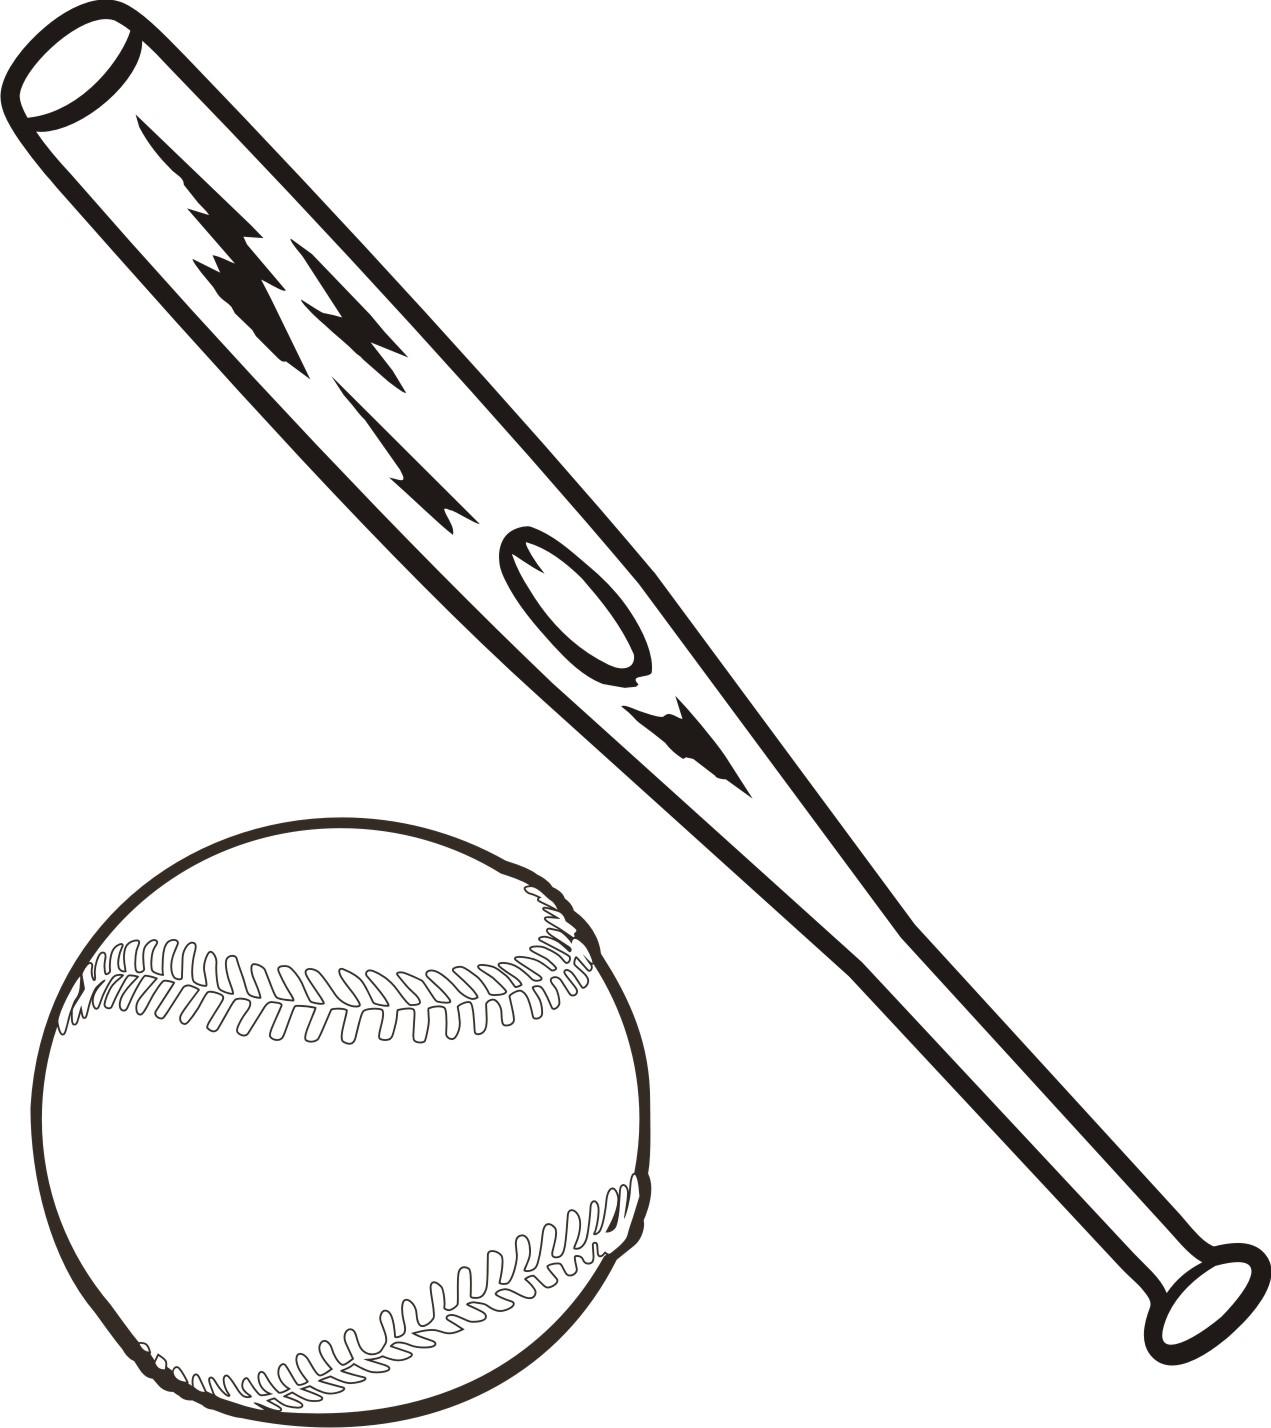 Baseball bat softball bats crossed clipart 2.